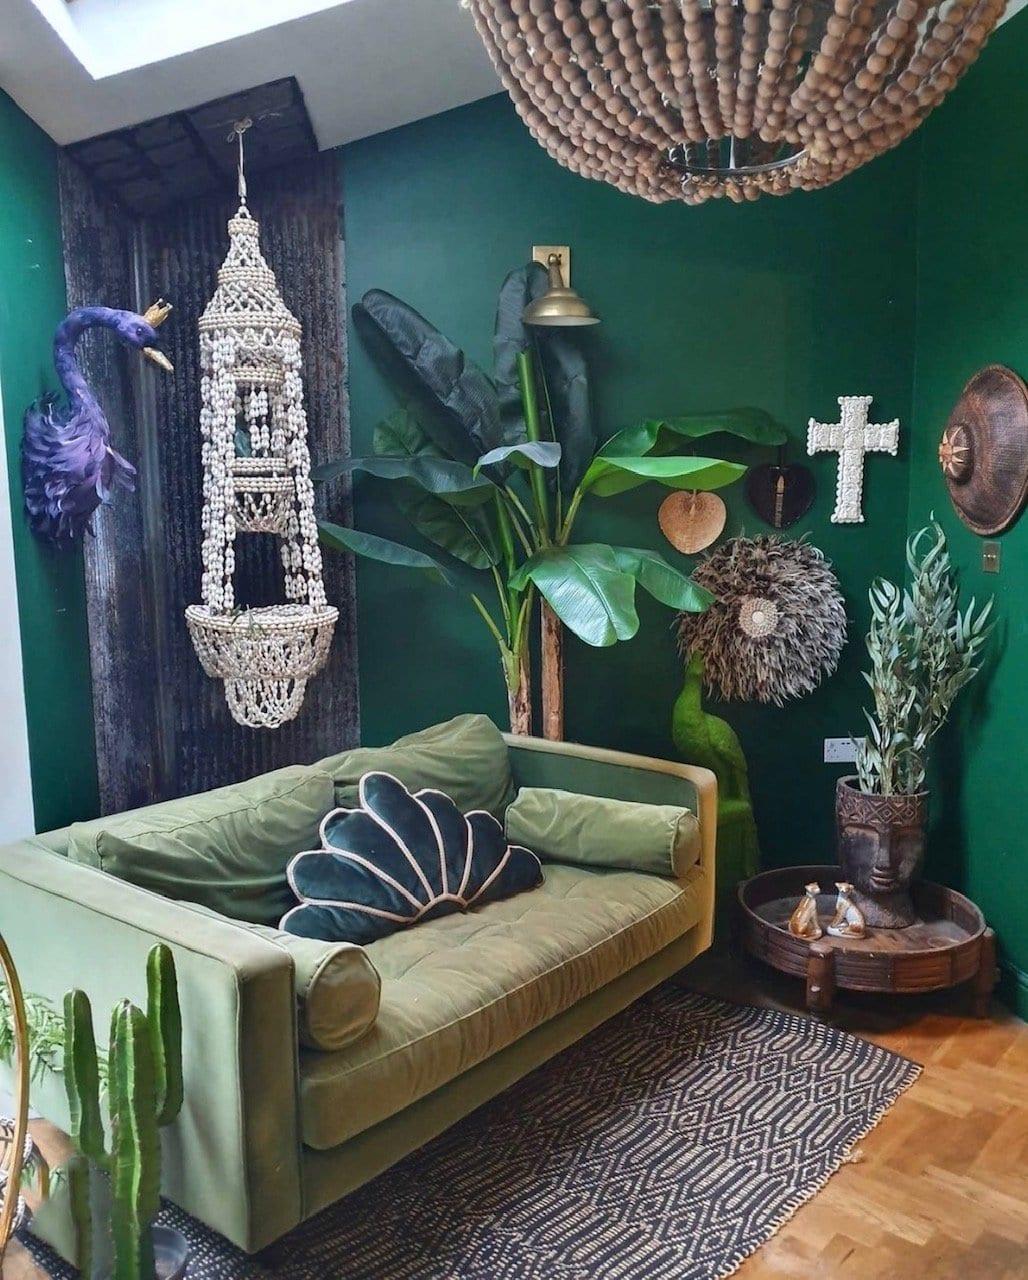 shells, scallop, furniture, interiors, homewares, interior trends, seasonal trends, home decor, home decor ideas, trends, coastal, sea side, sea side interiors, interior design